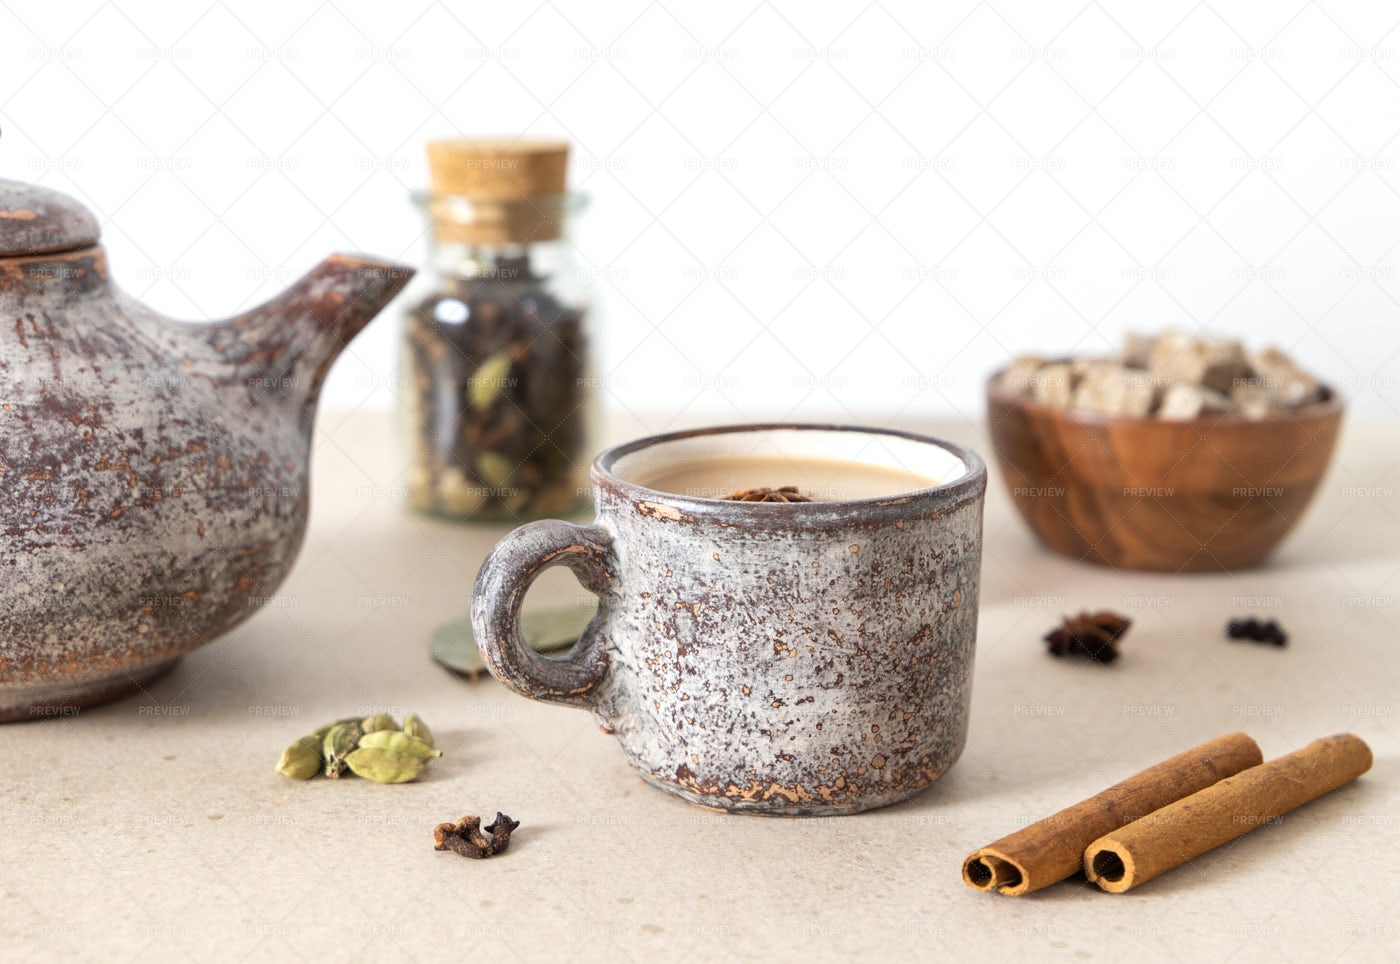 Ceramic Mug Of Tea: Stock Photos